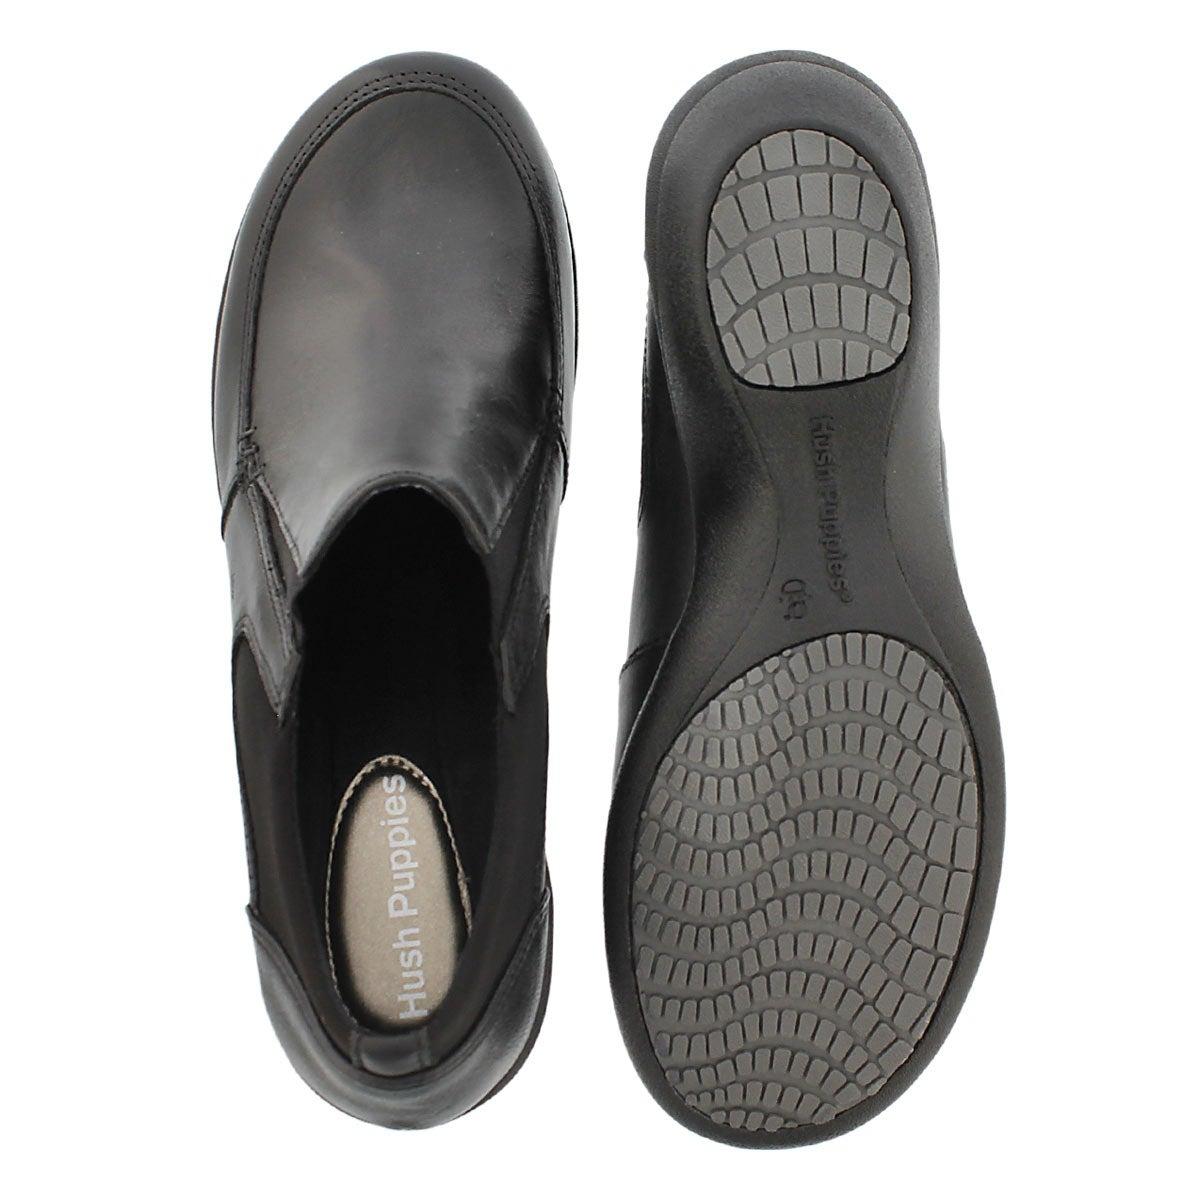 Lds Jessa Kana black slip on dress wedge